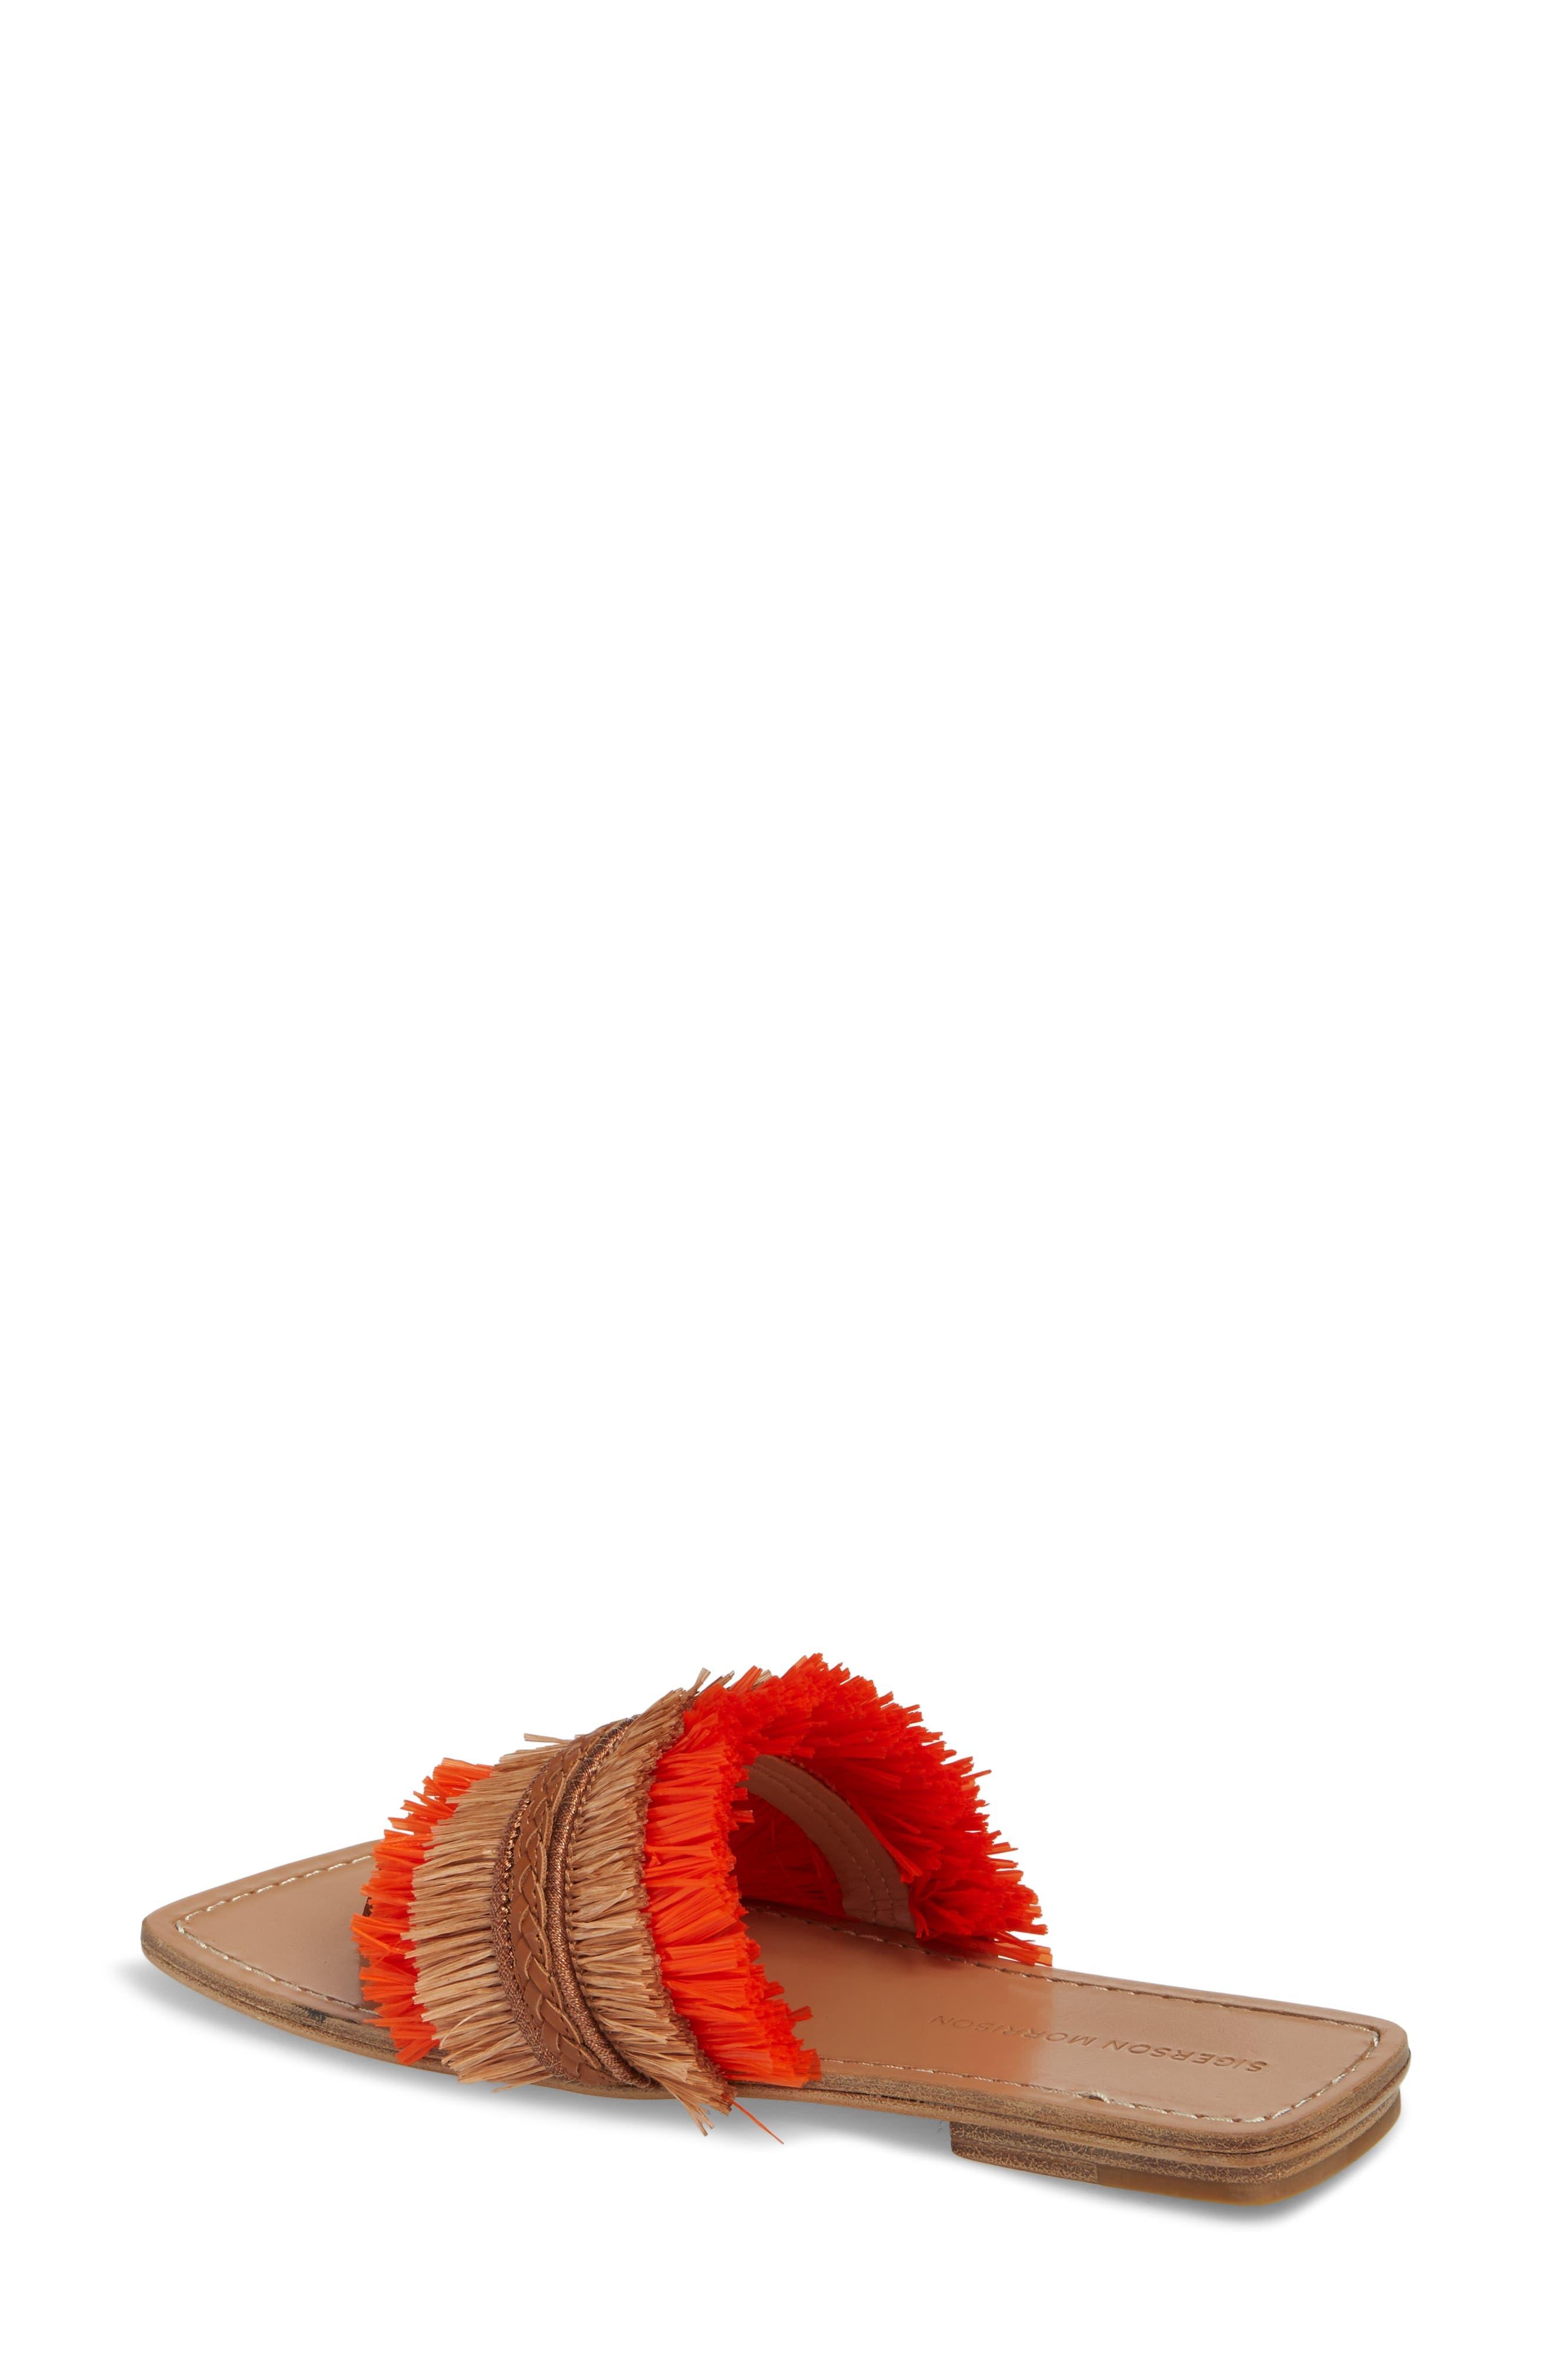 Woven Sandal,                             Alternate thumbnail 2, color,                             Tan/ Orange